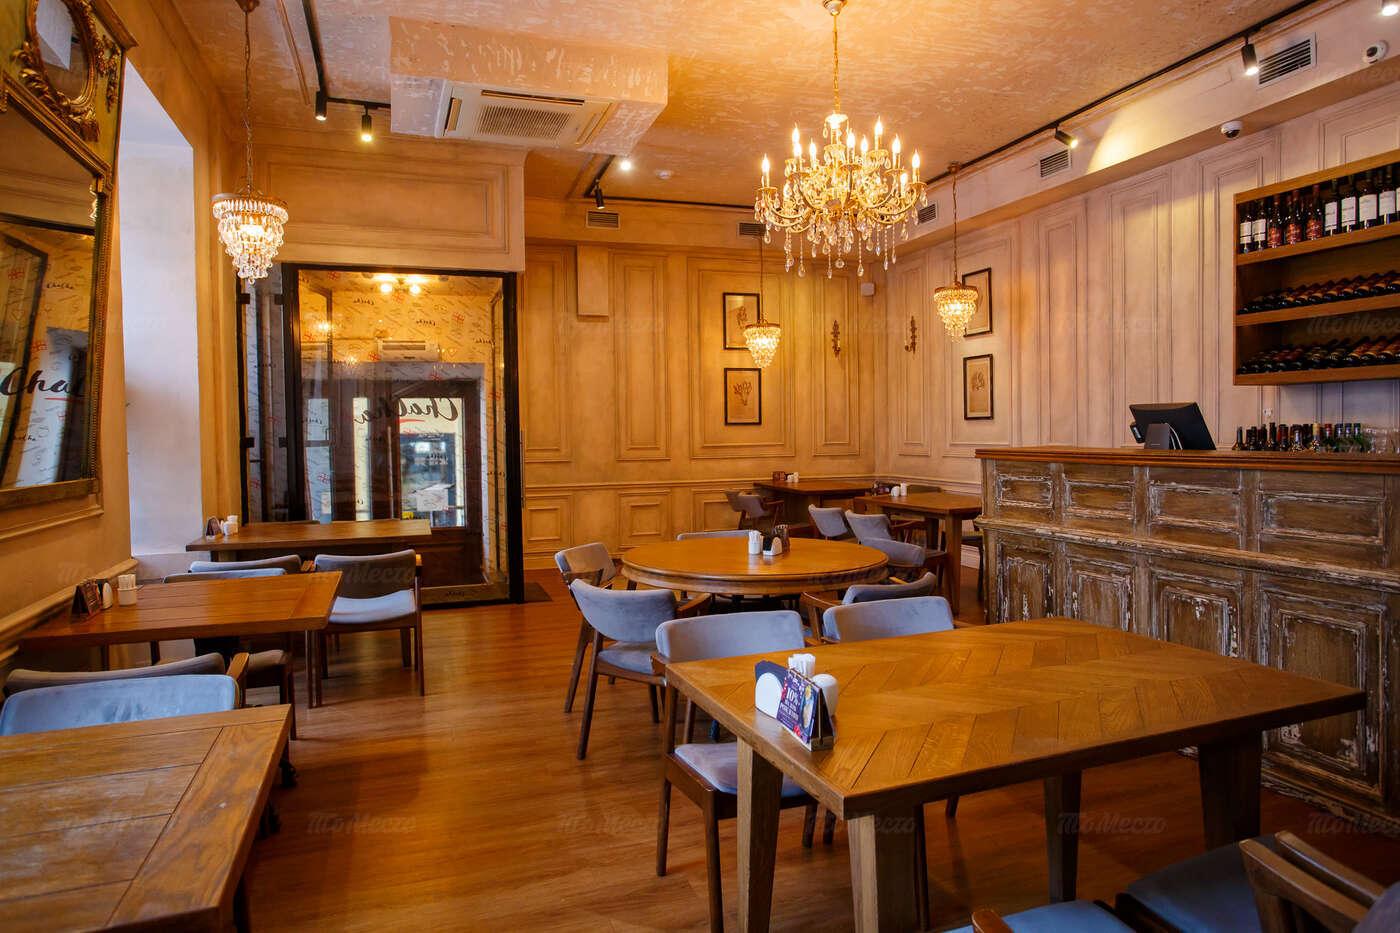 Ресторан Чача на набережной канала Грибоедова фото 15